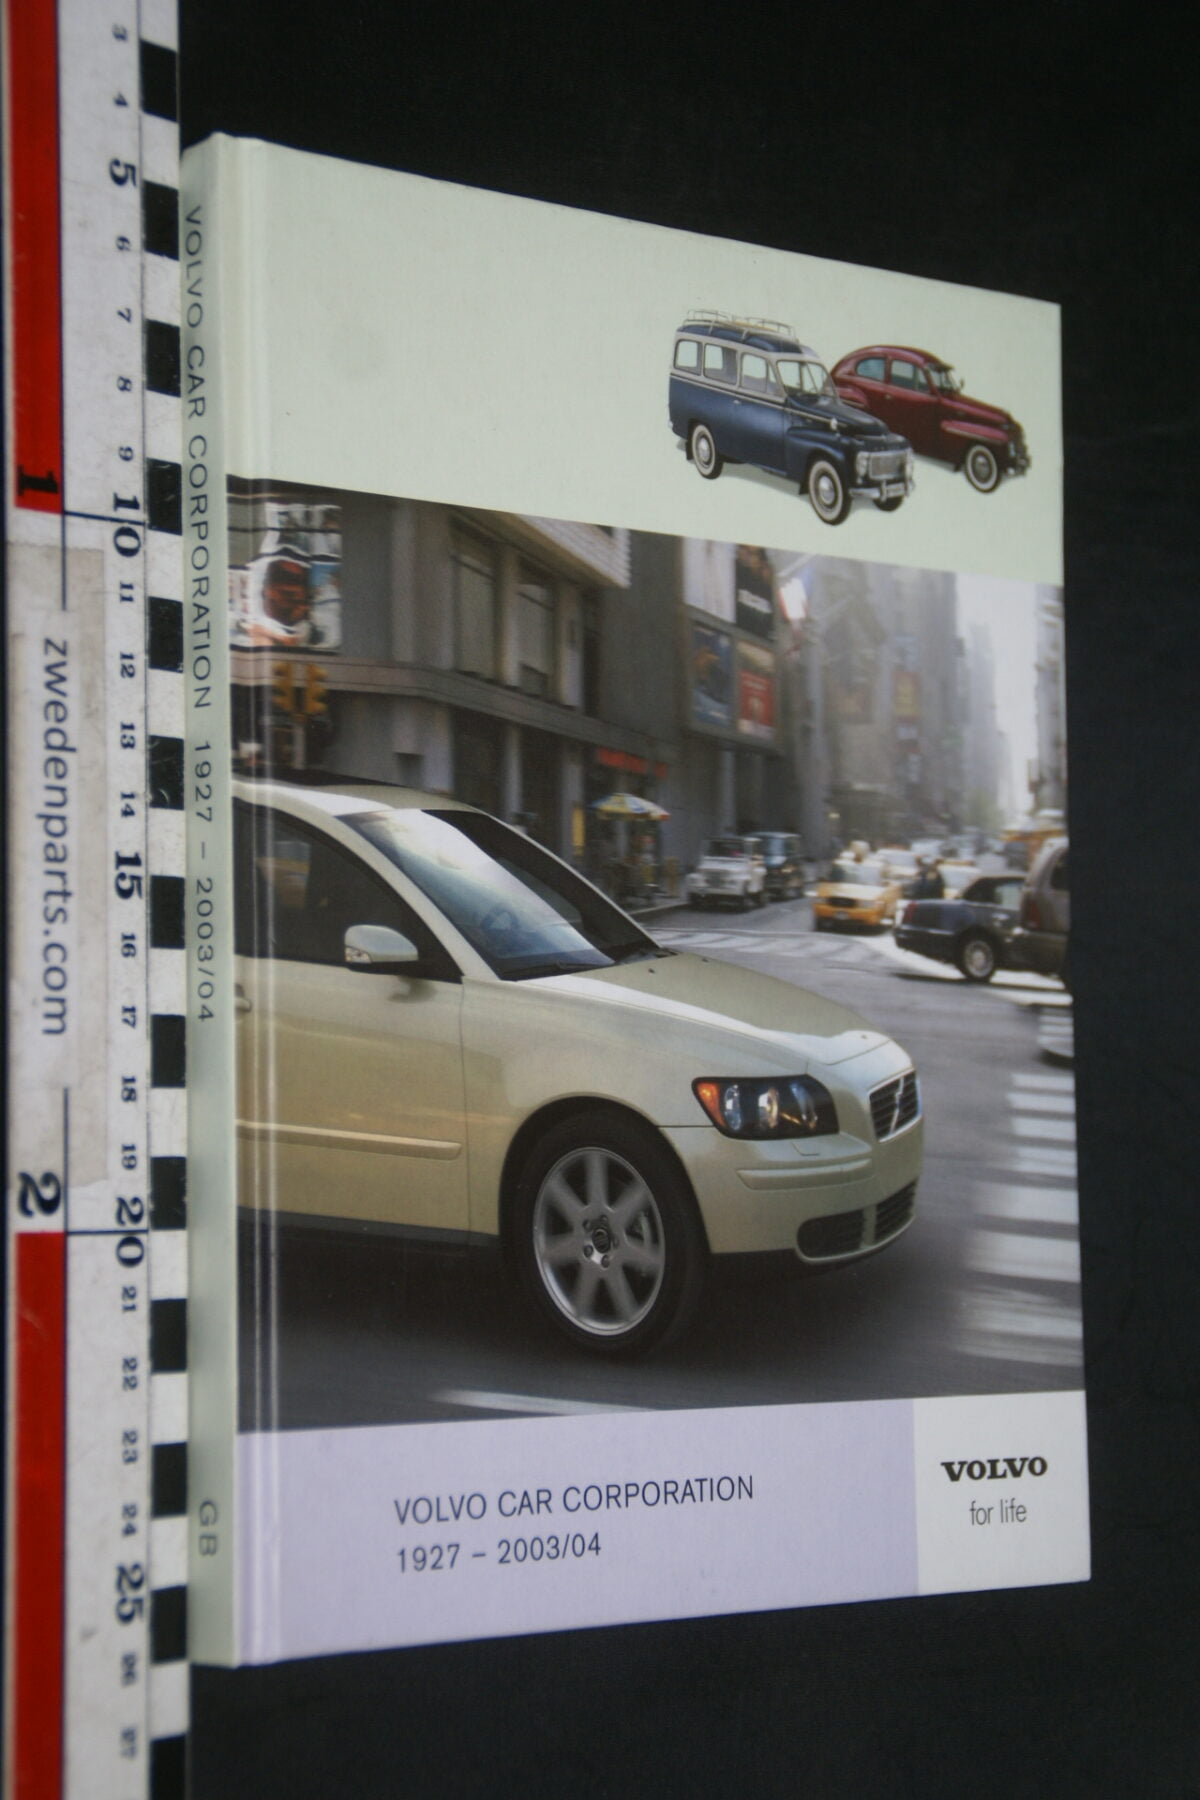 DSC02456 2004 jaarboek Volvo 1927-2004, nr VFL1116, English-3b36f4af